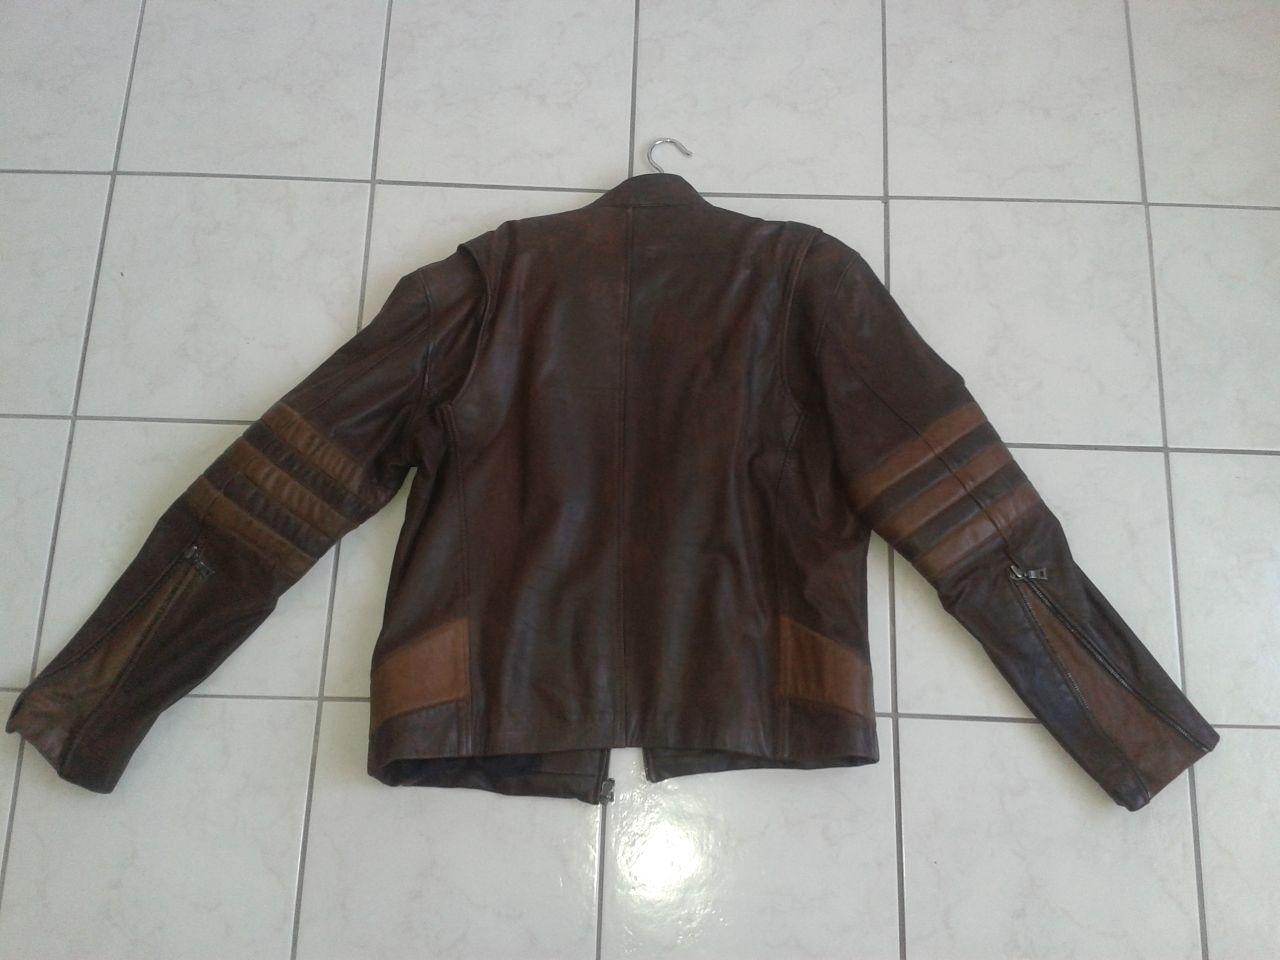 Leather jacket yellow stripe - Image Jacket 2 W Yellow Stripes